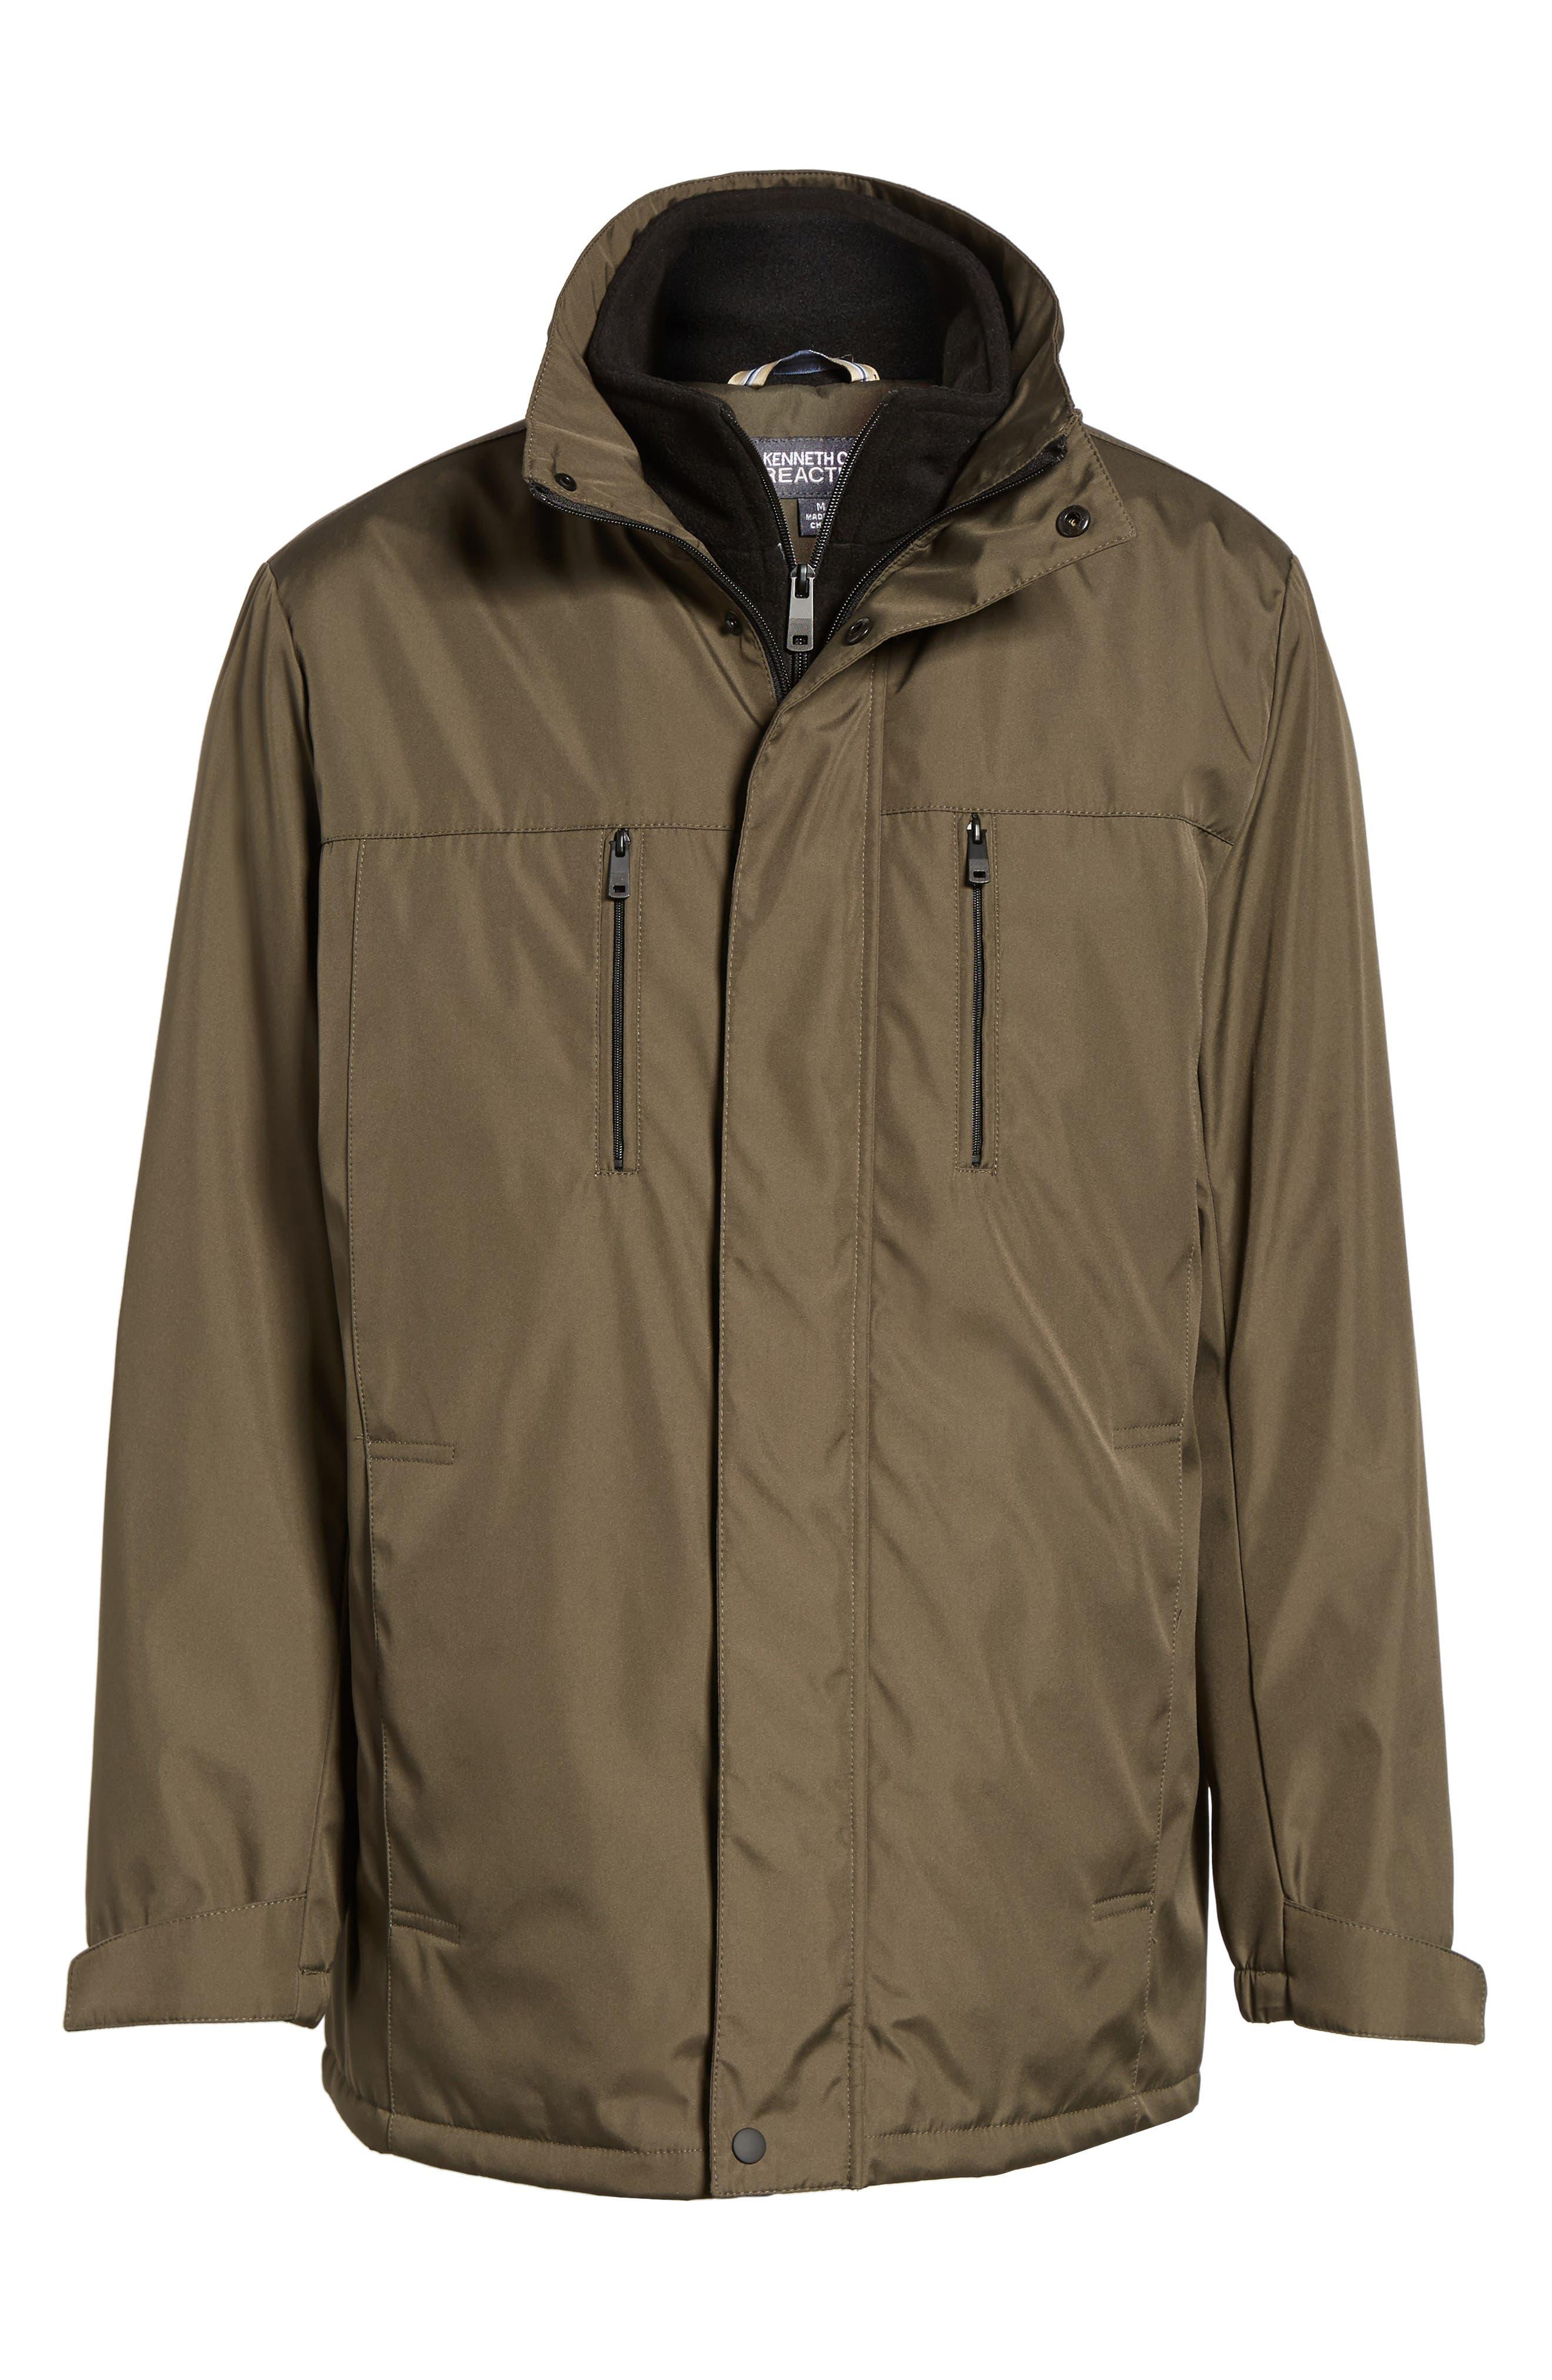 Hooded Jacket with Inset Fleece Bib,                             Alternate thumbnail 19, color,